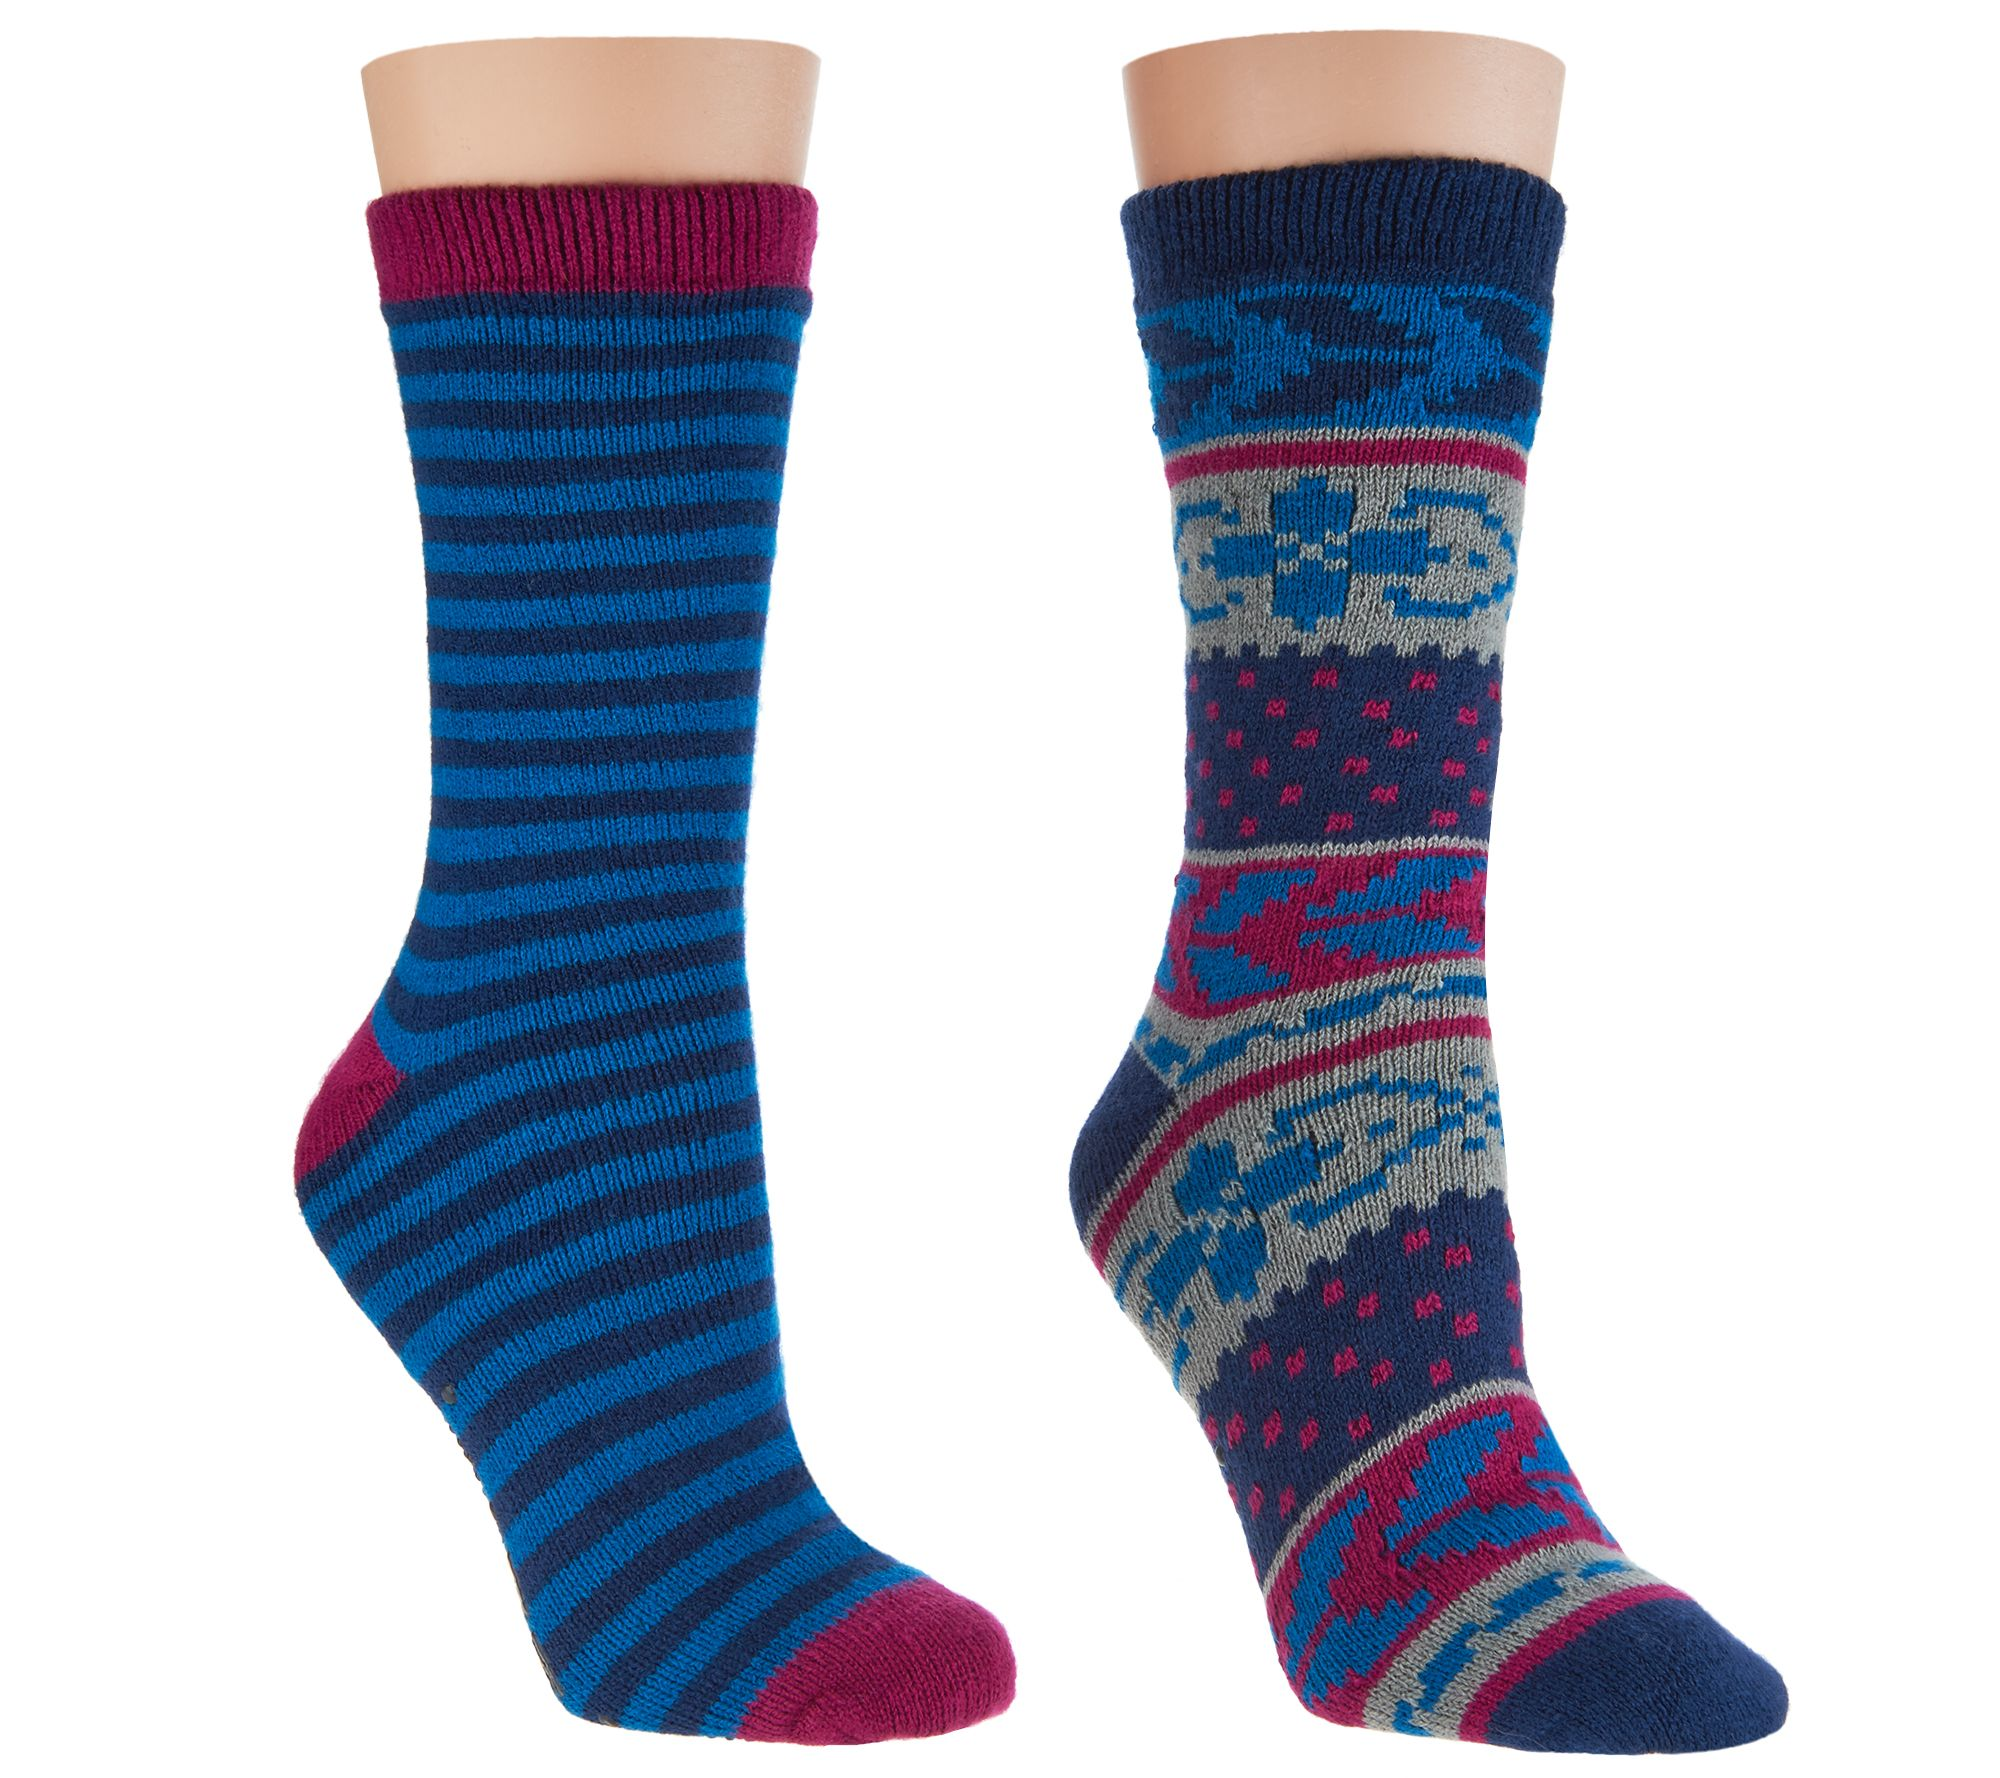 76359e760 MUK LUKS Cozy-Lined Socks Set of 2 - Page 1 — QVC.com